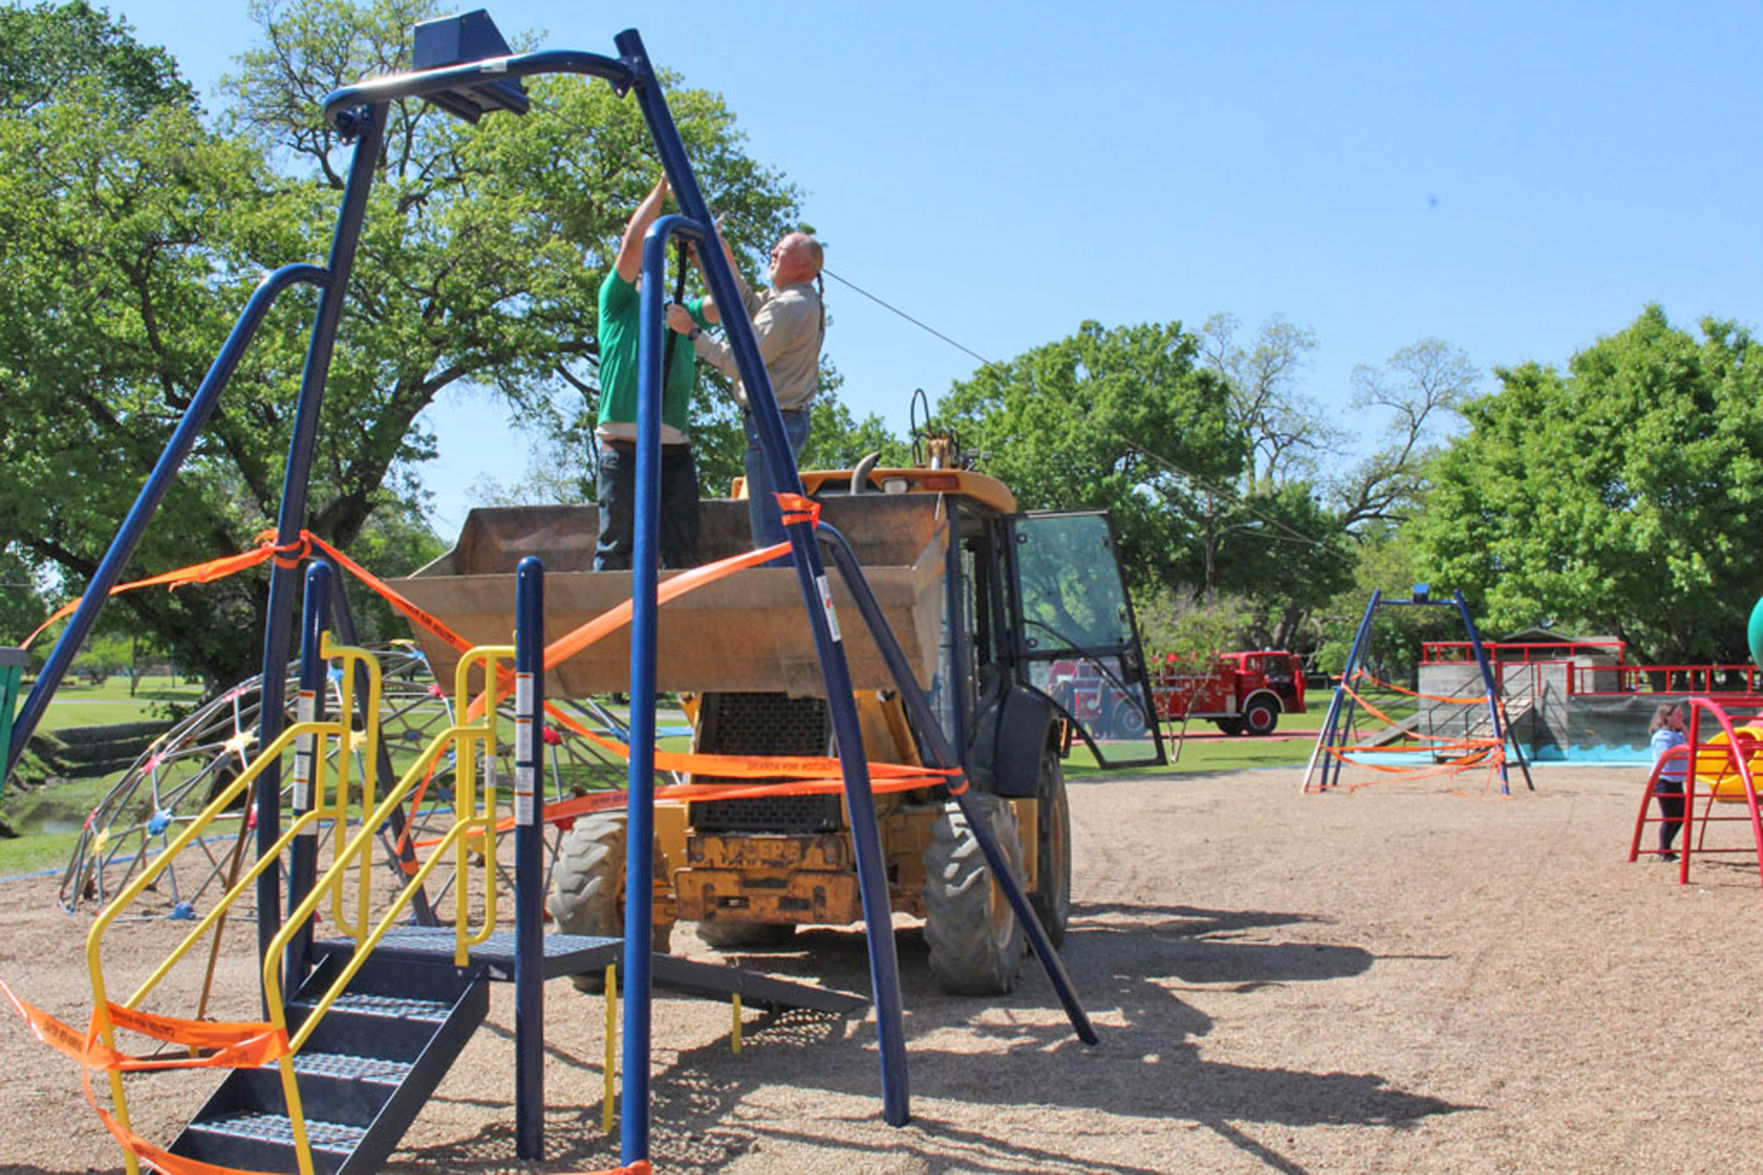 PHOTOS Community Park opens new zipline attraction